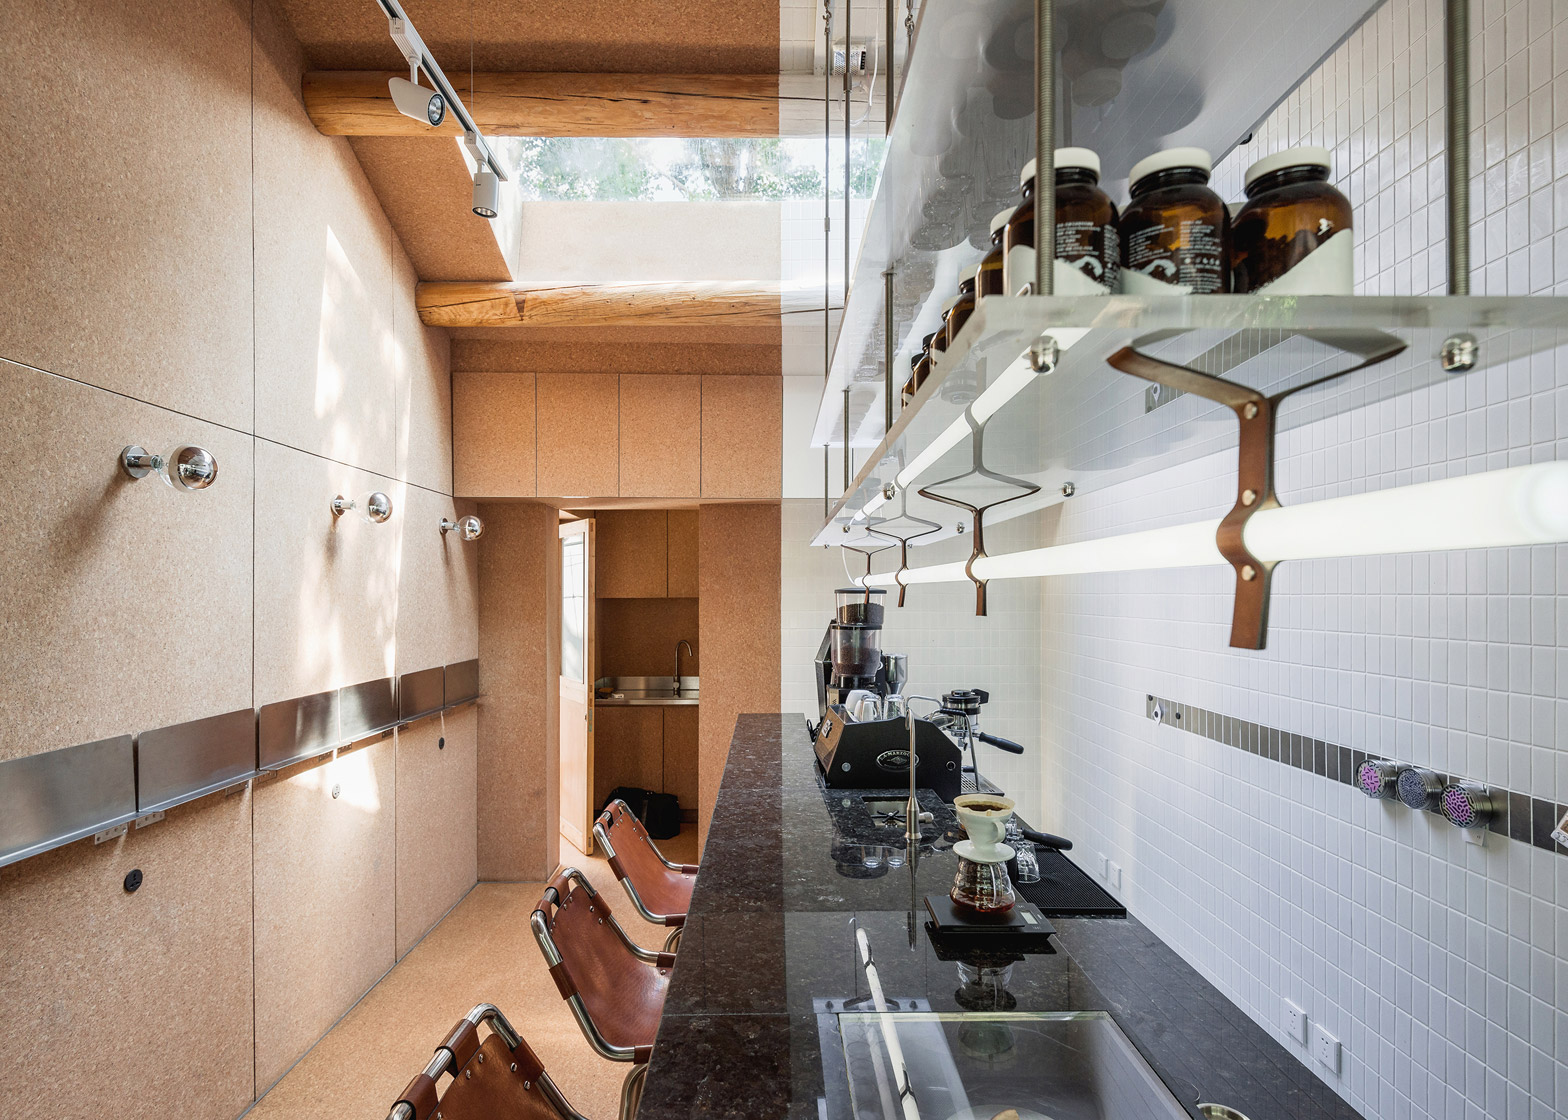 big-small-coffee-bar-b-and-b-guest-room-hutong-office-aio-beijing-cork_dezeen_1568_11